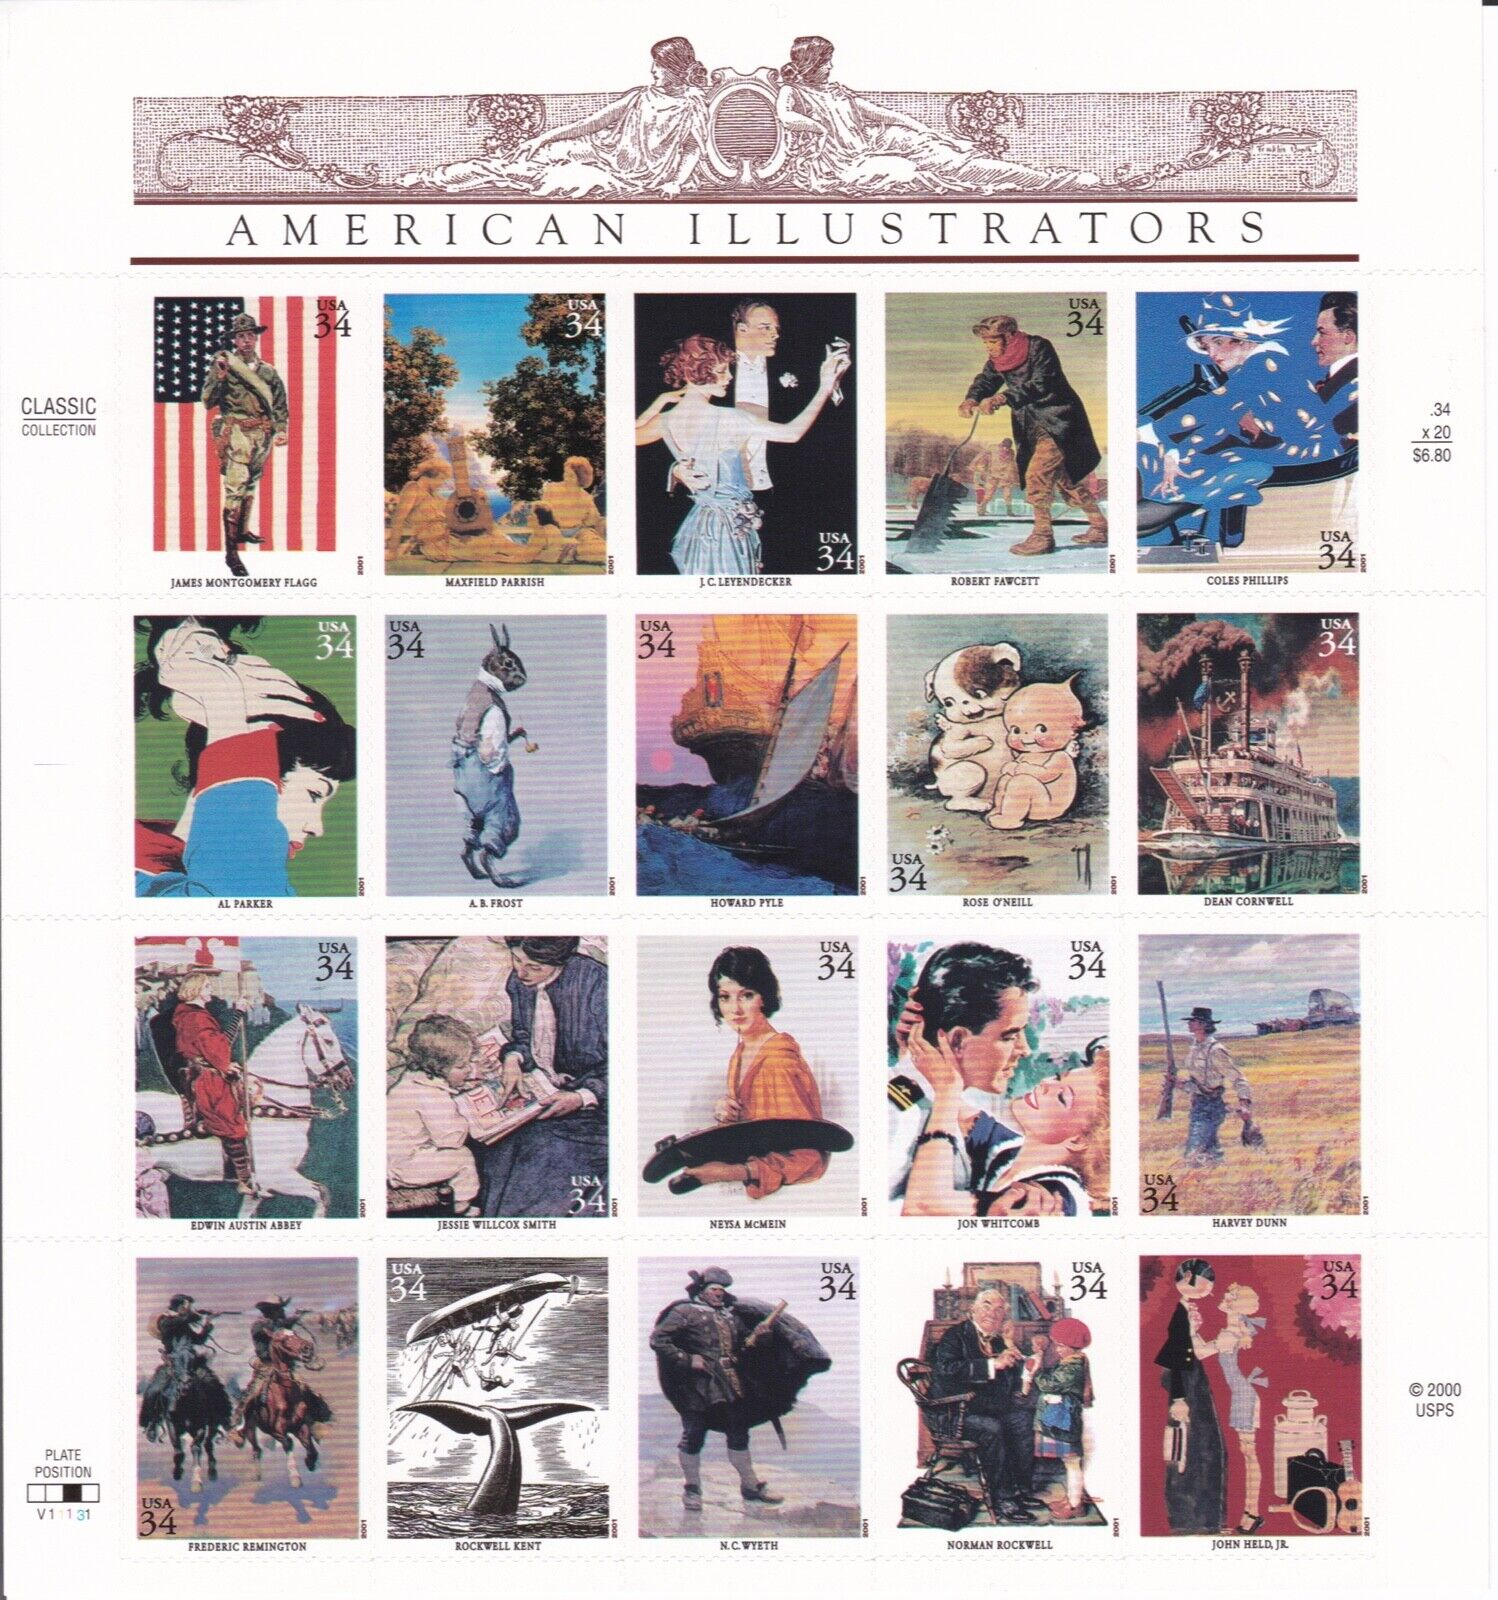 Scott 3502 - US Sheet Of 20 - AMERICAN ILLUSTRATORS - MNH - 2001 - $9.99